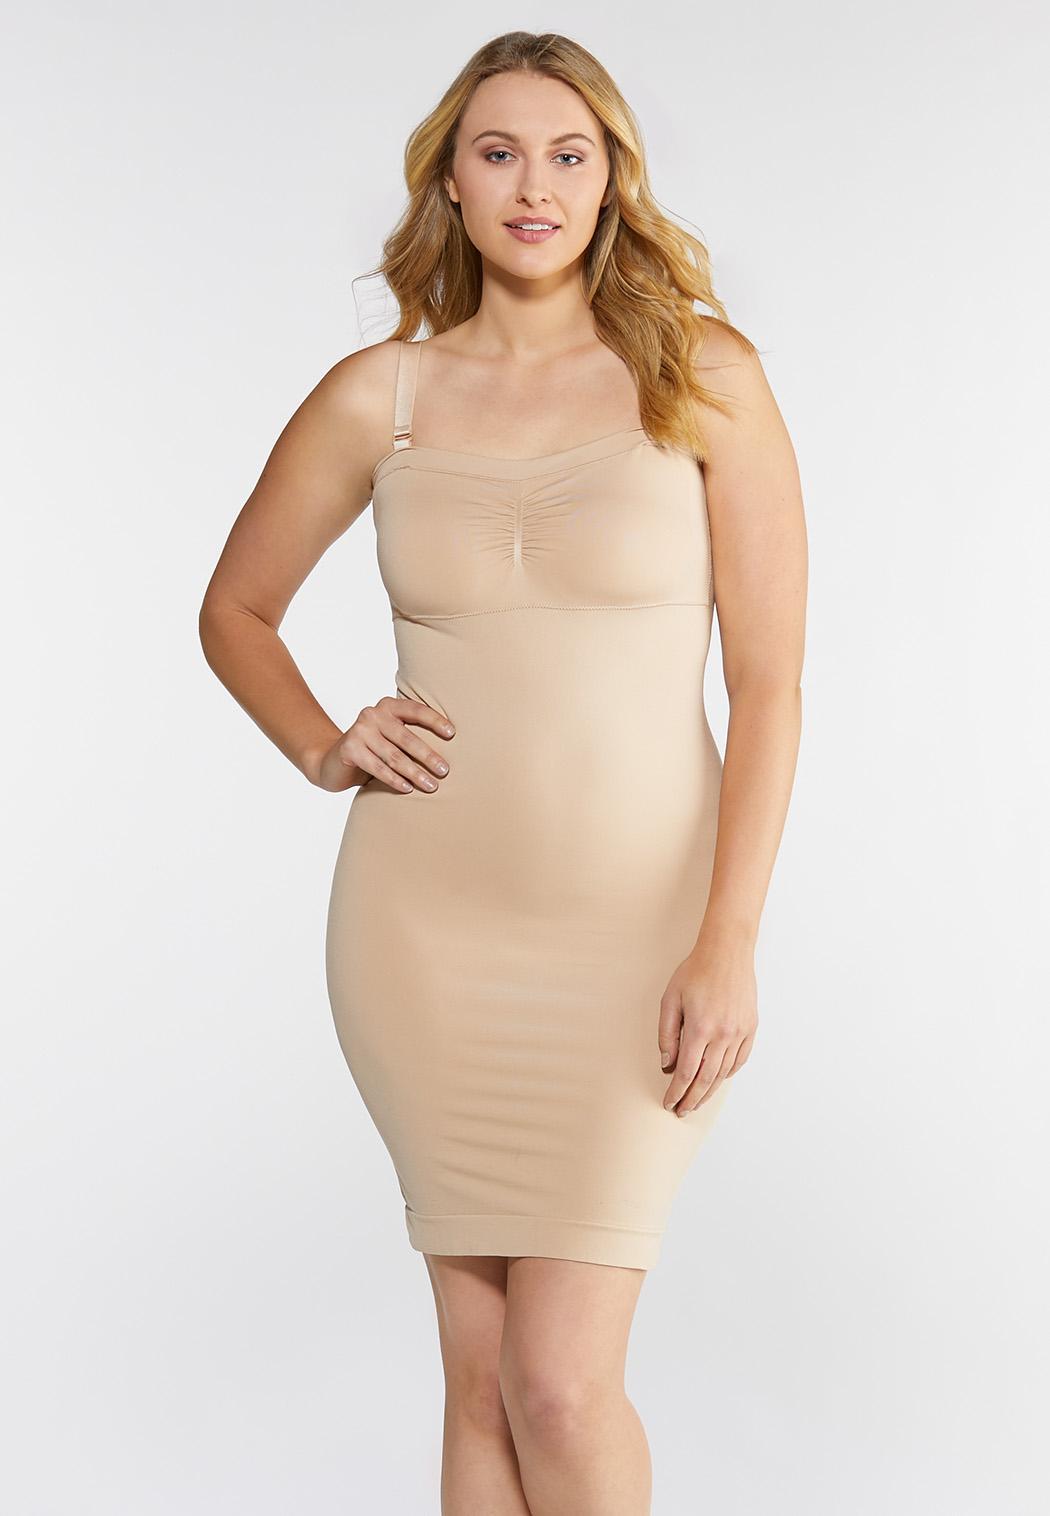 Plus Size Nude Seamless Midi Slip Intimates Cato Fashions